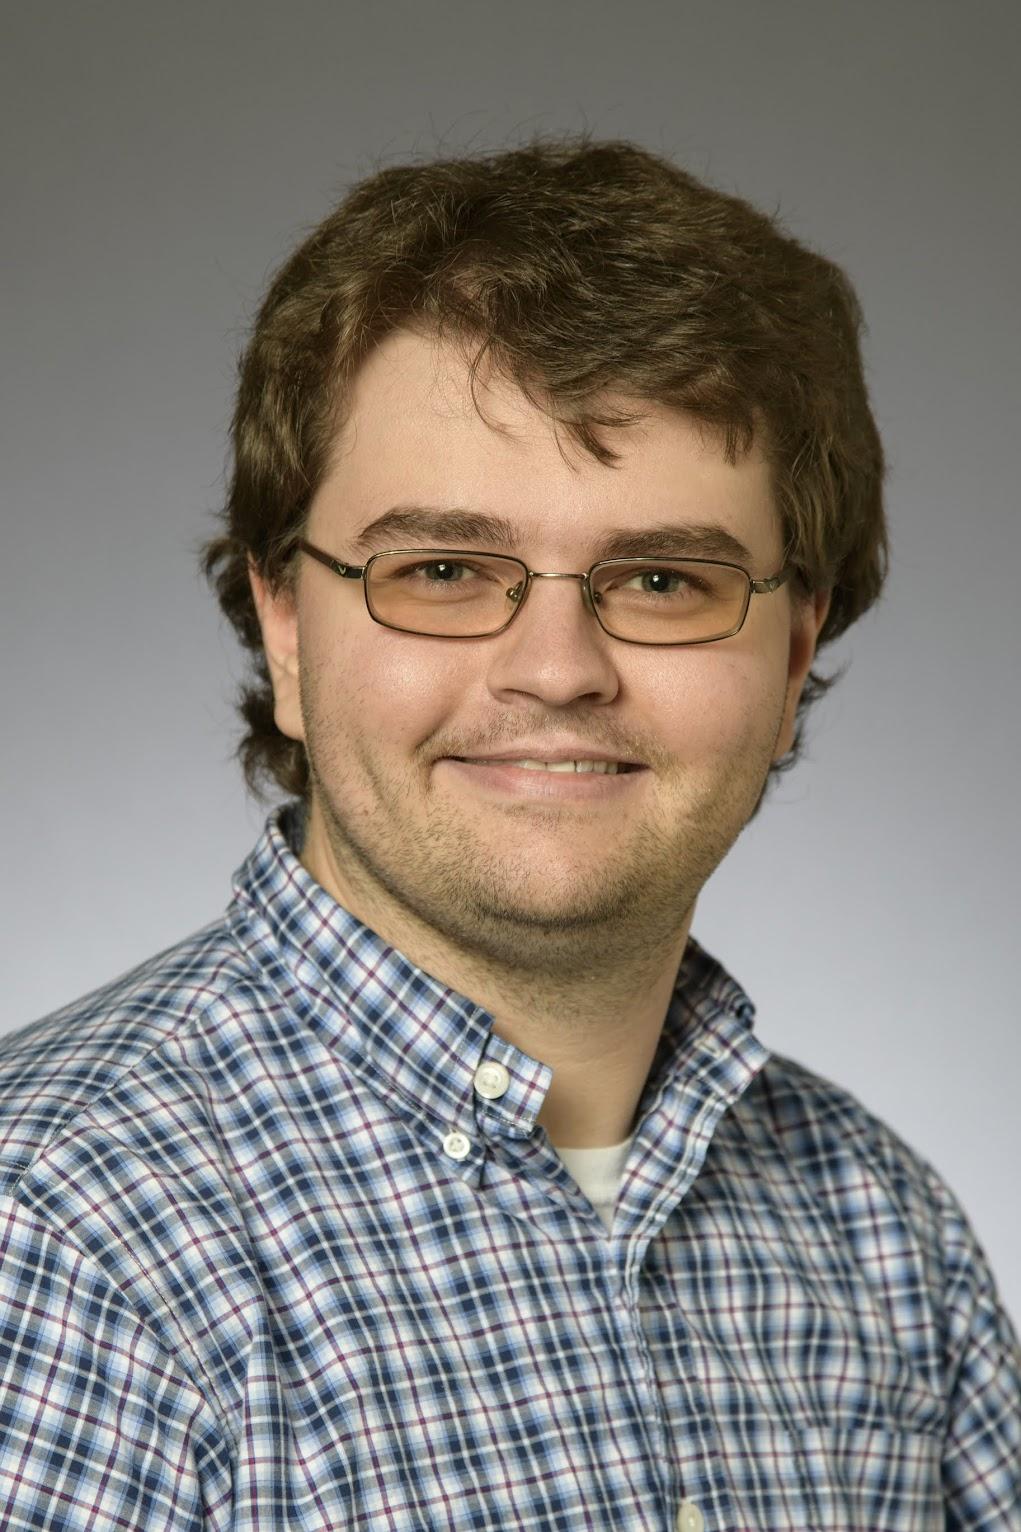 Simon Swenson